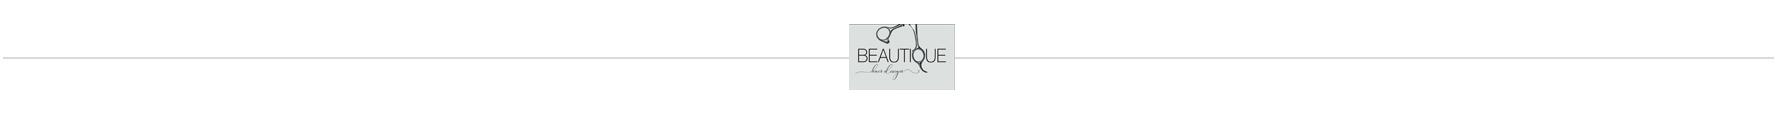 Beautique line.jpg